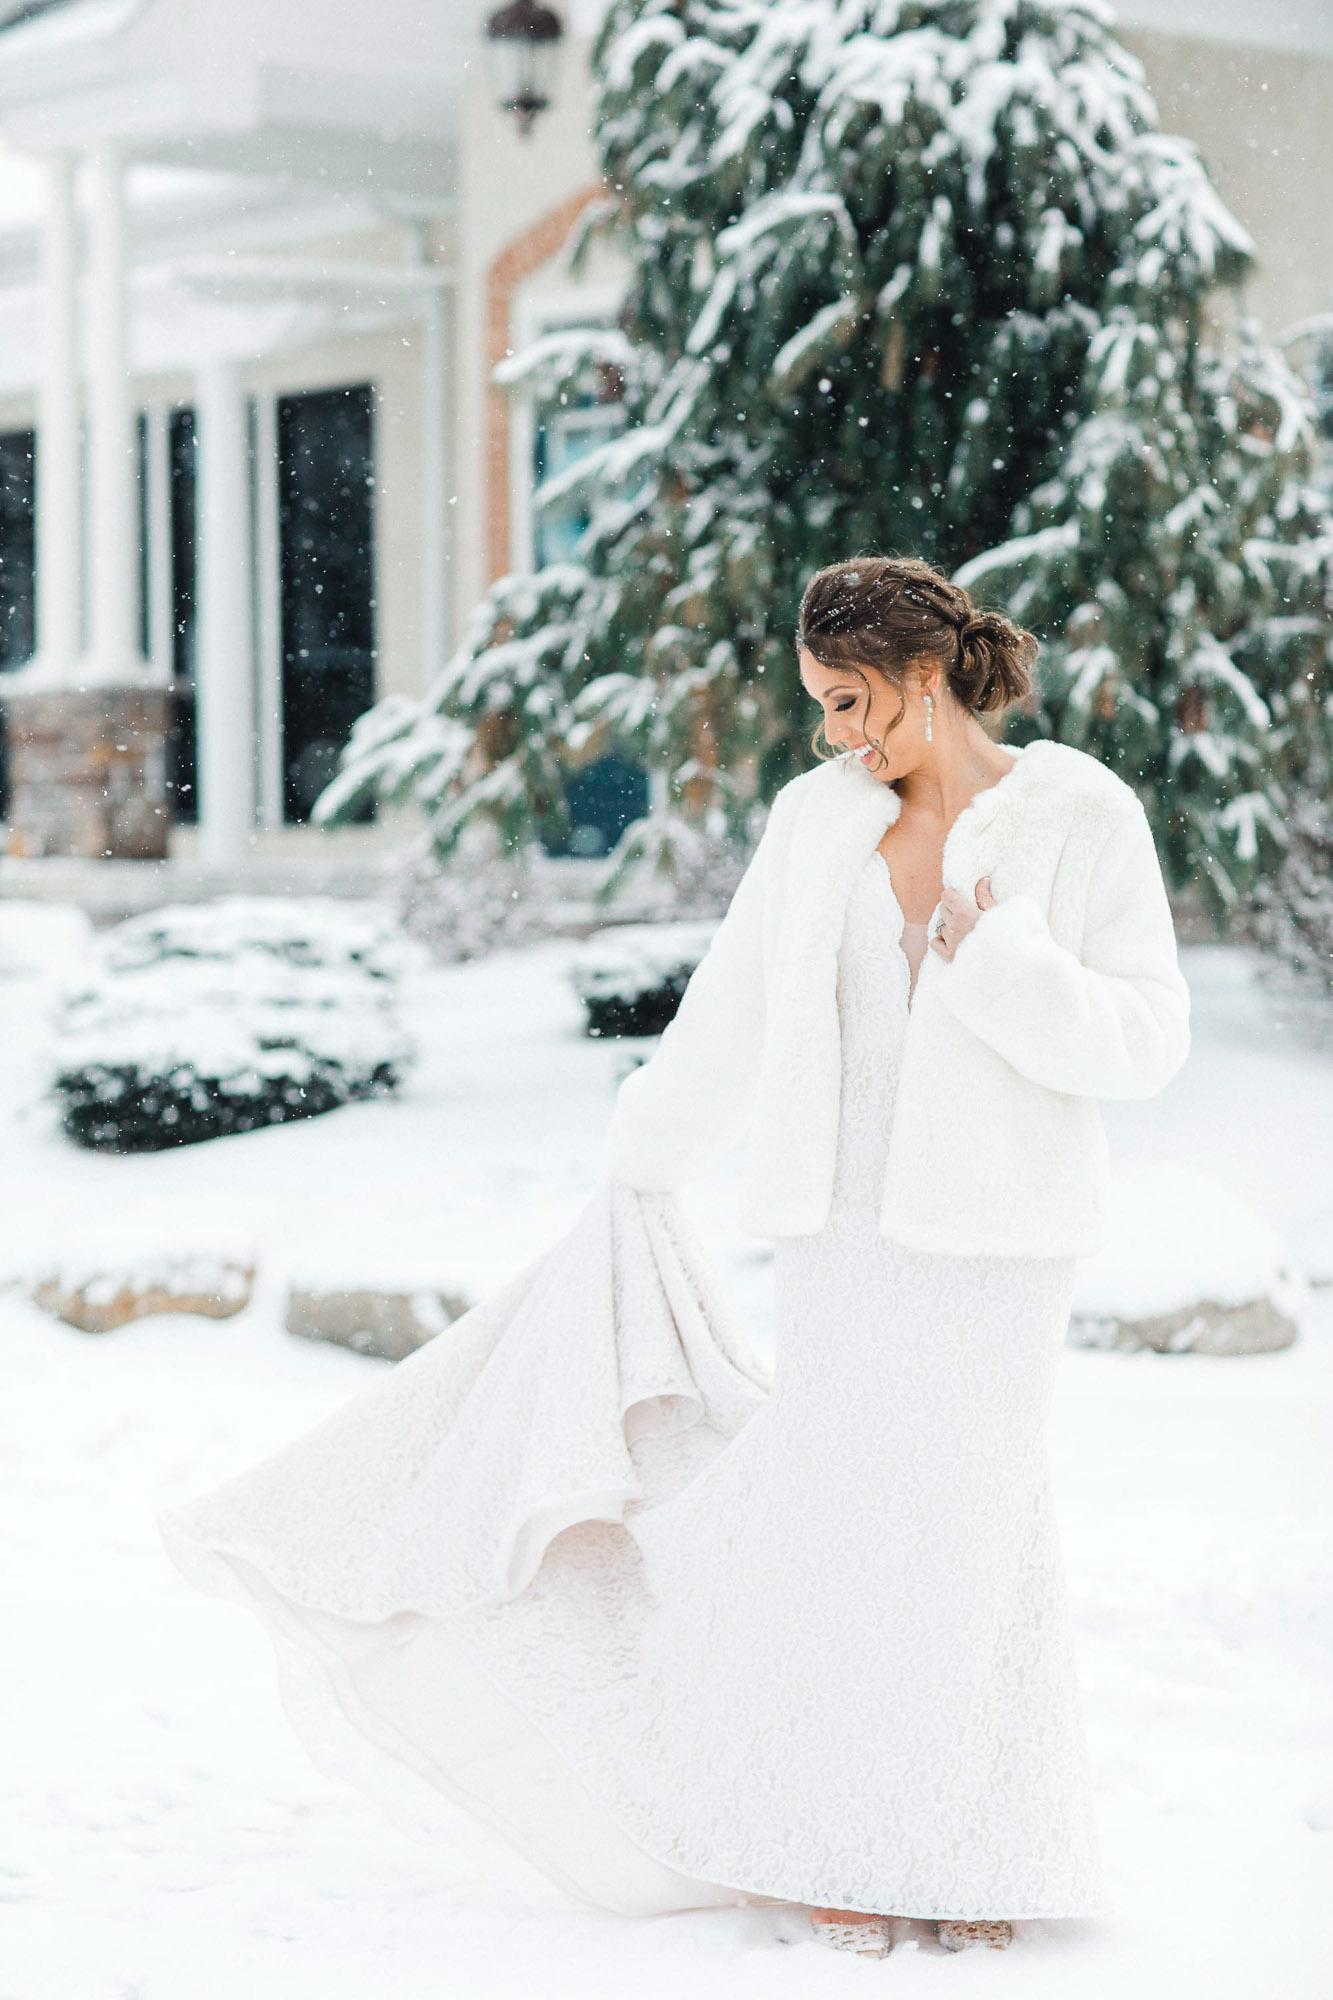 snowy-sand-springs-country-club-drums-pa-christmas-wedding-24145.jpg